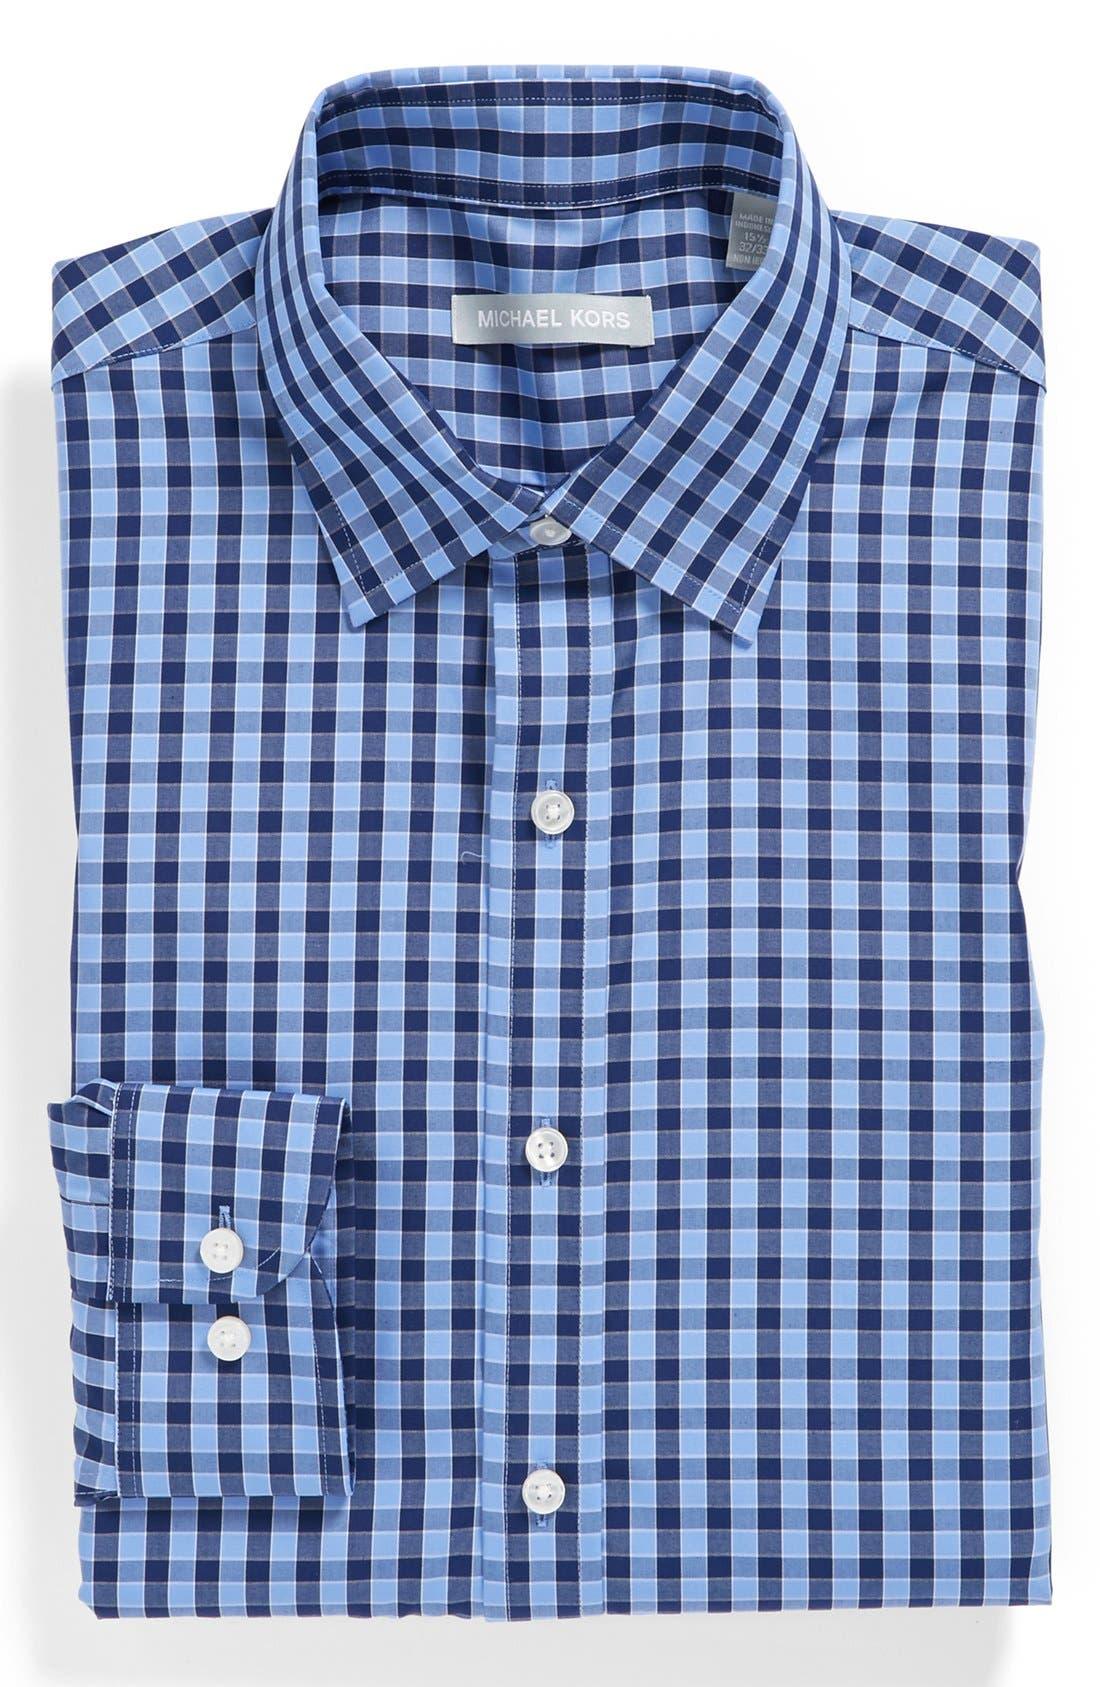 Alternate Image 1 Selected - Michael Kors Gingham Regular Fit Non-Iron Dress Shirt